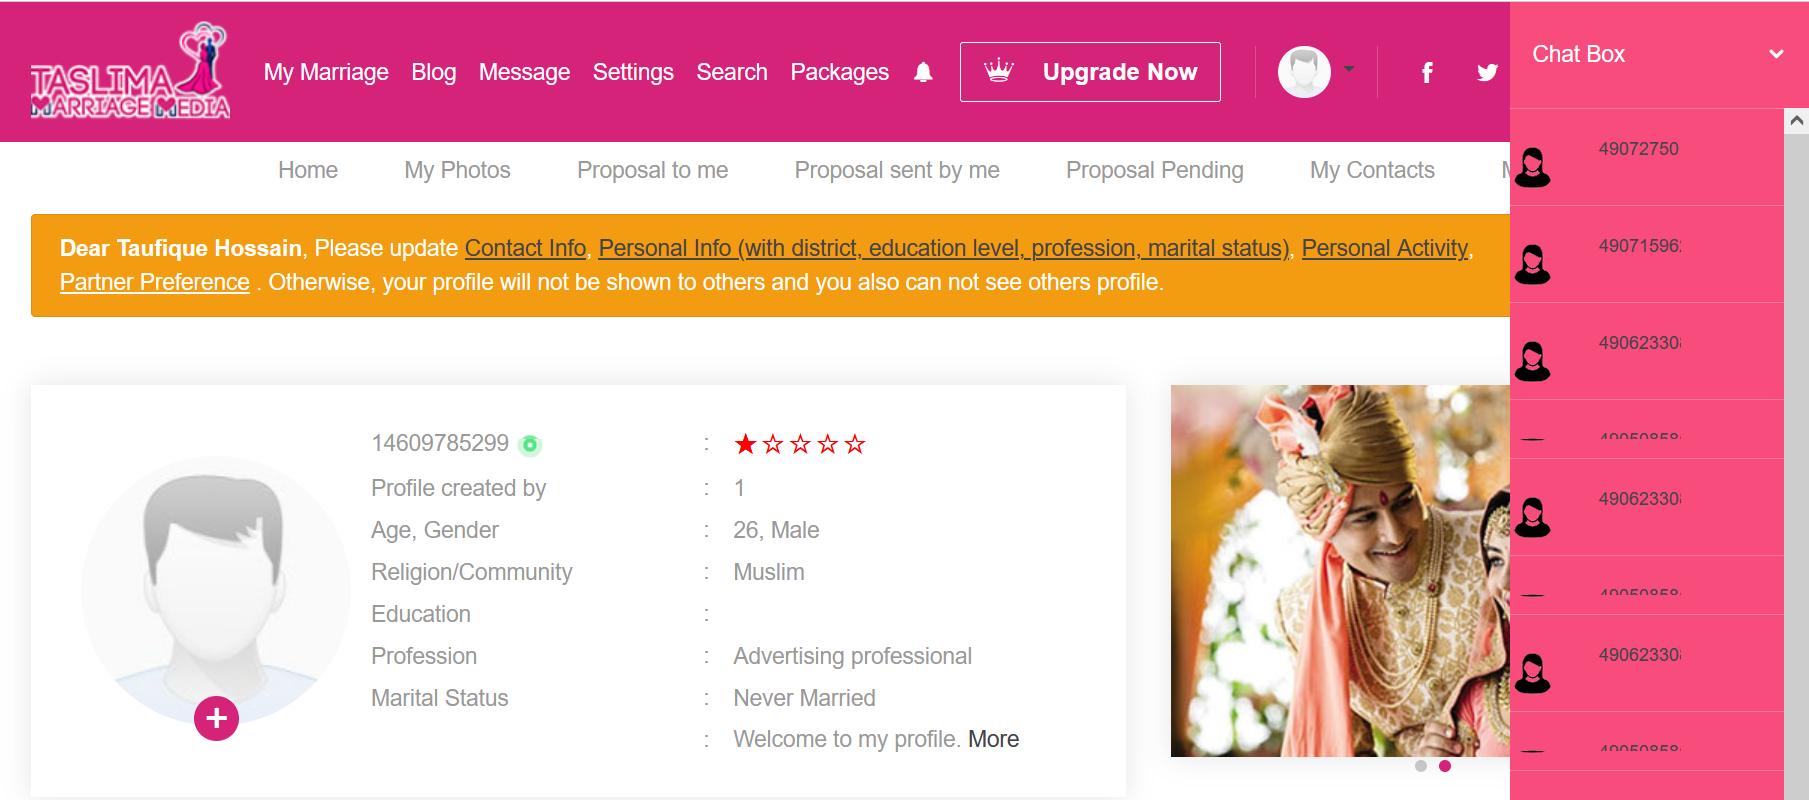 taslima marriage media login